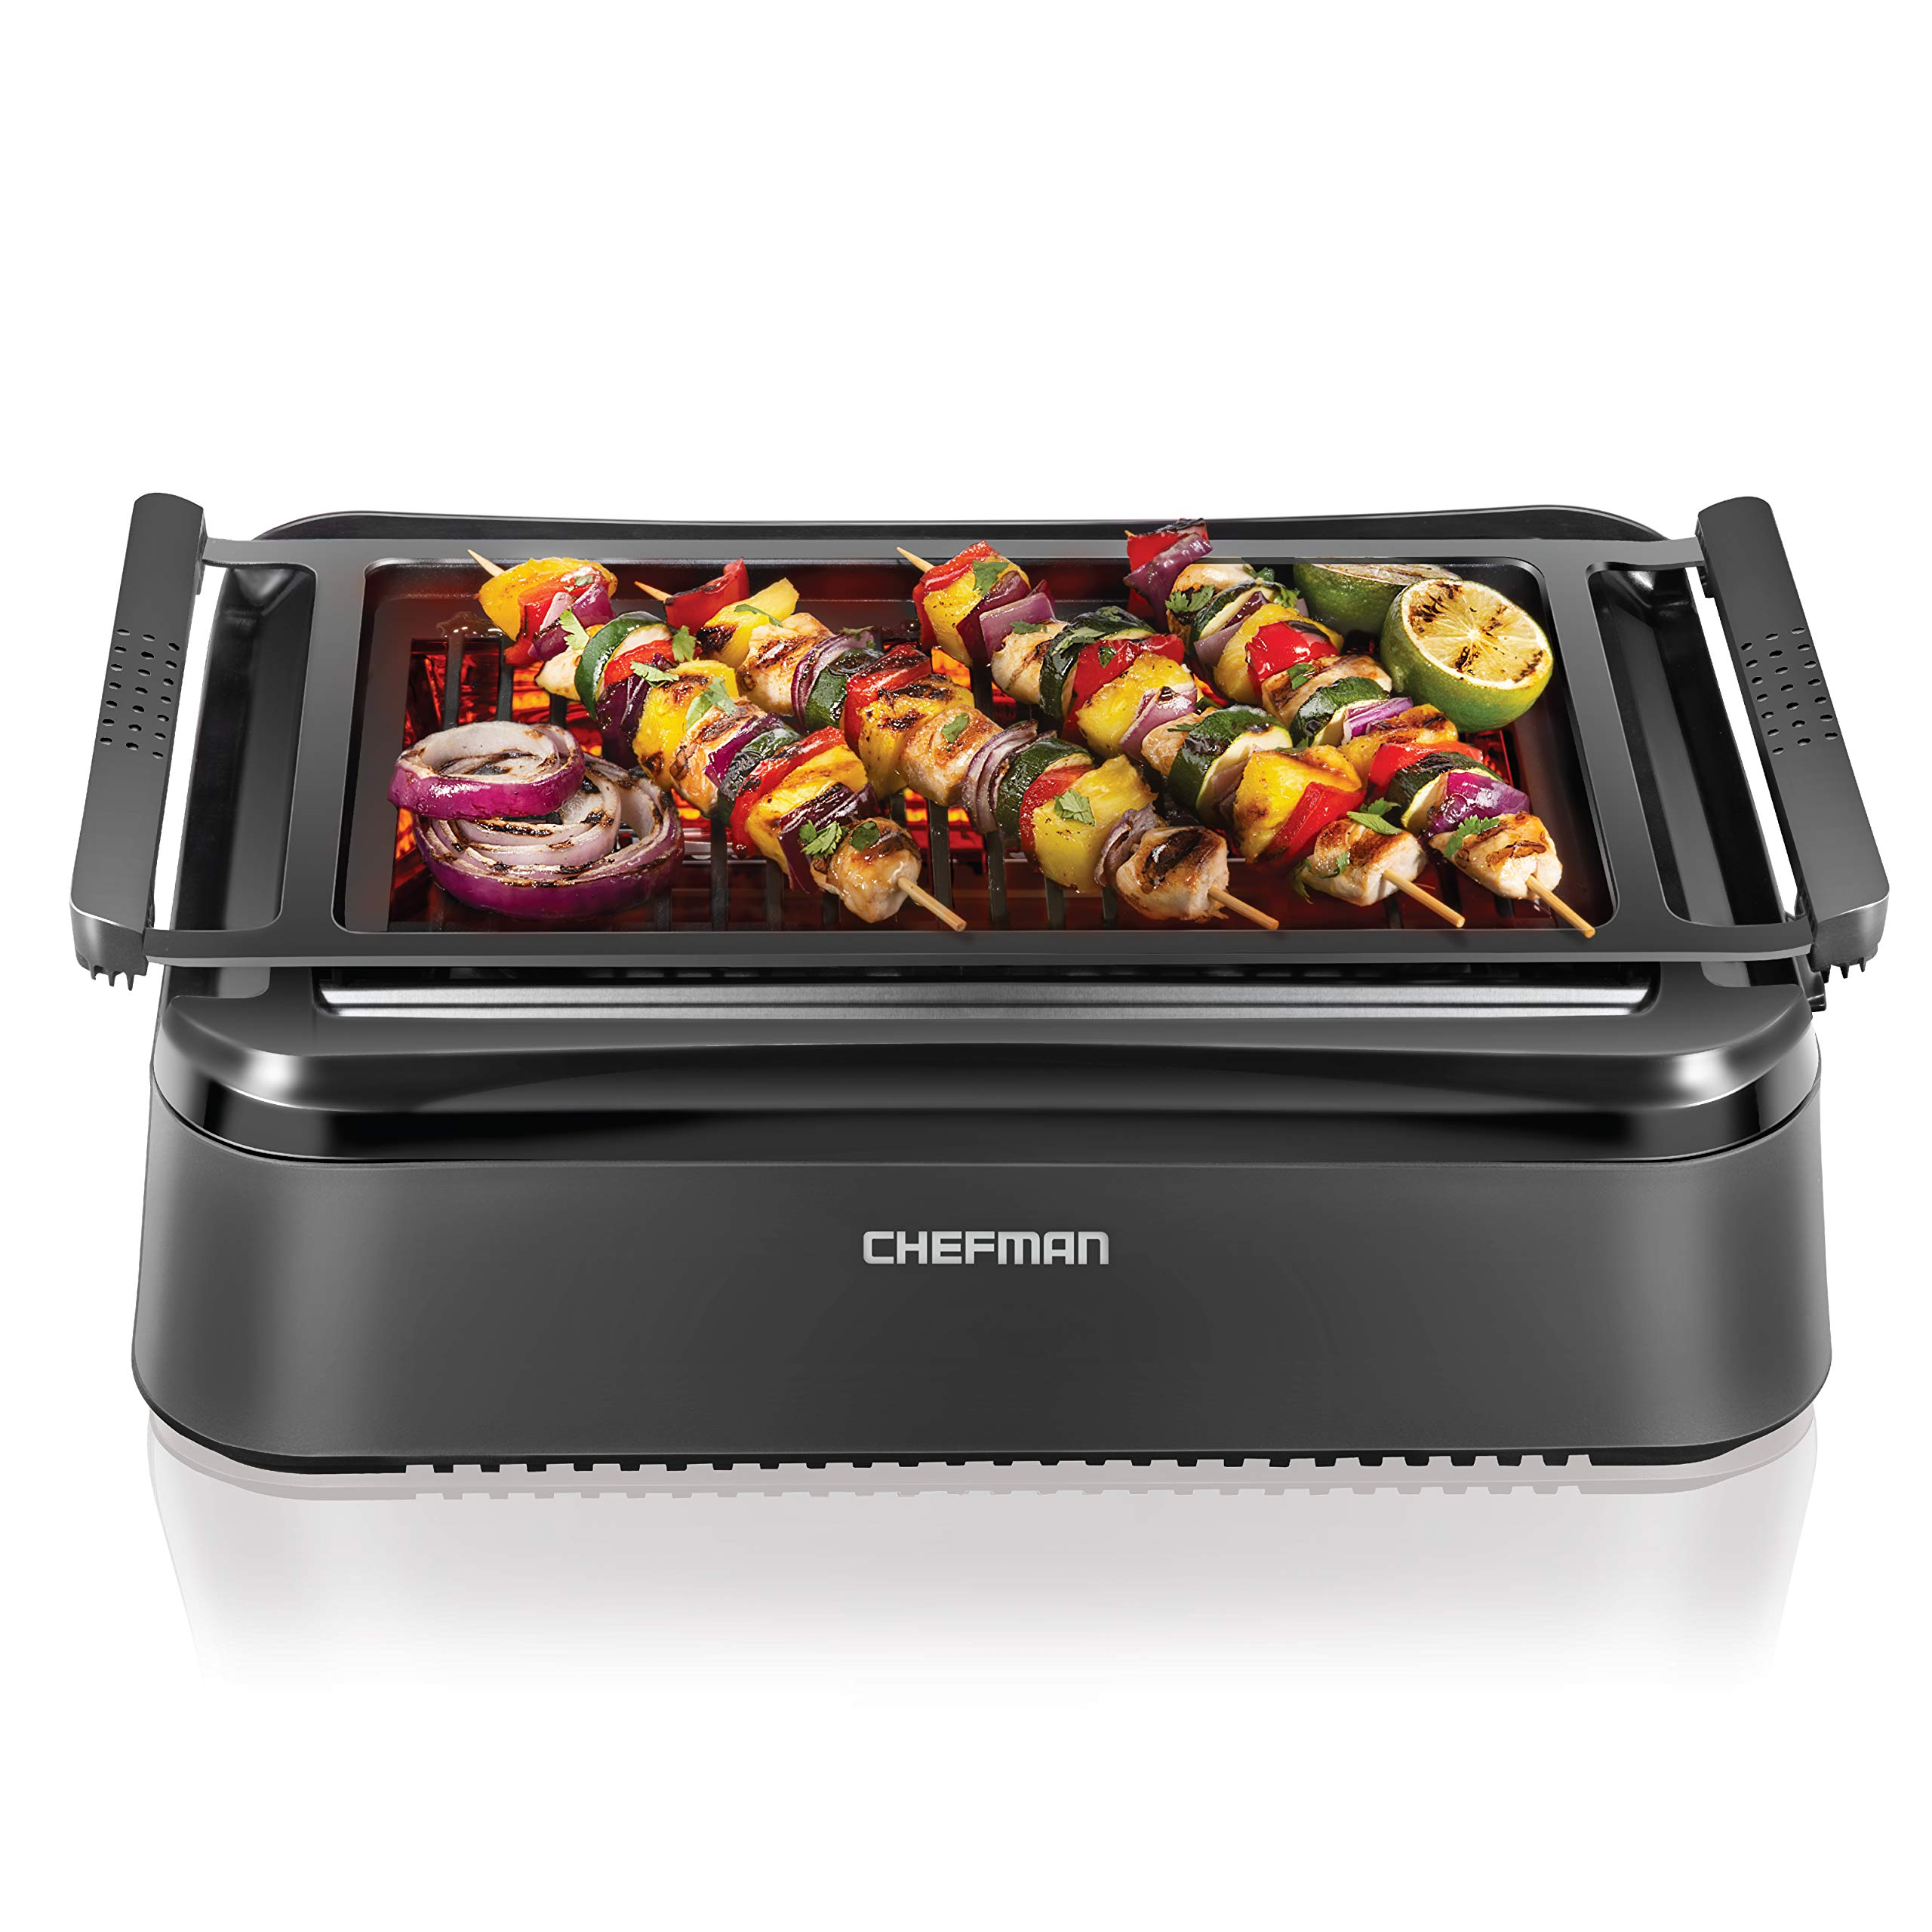 Chefman Electric Smokeless Temperature Dishwasher Safe